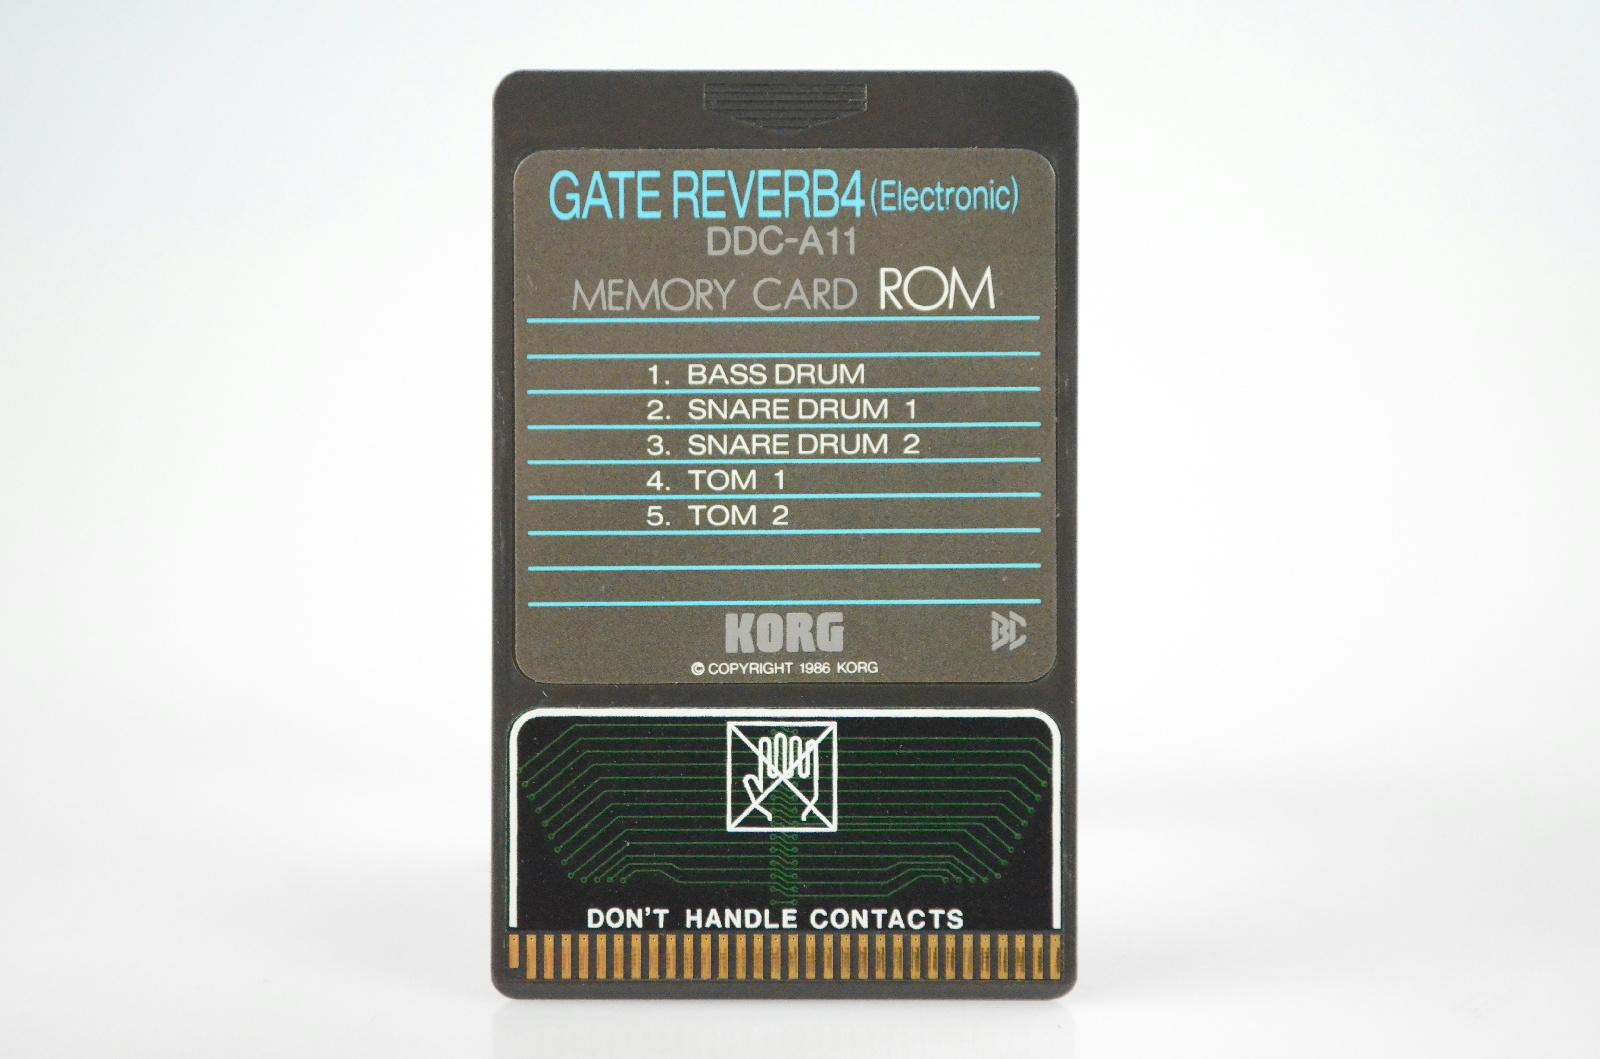 Korg Gate Reverb 4 DDC-A11 Memory Card ROM for DDD-1 Drum Machine #33898